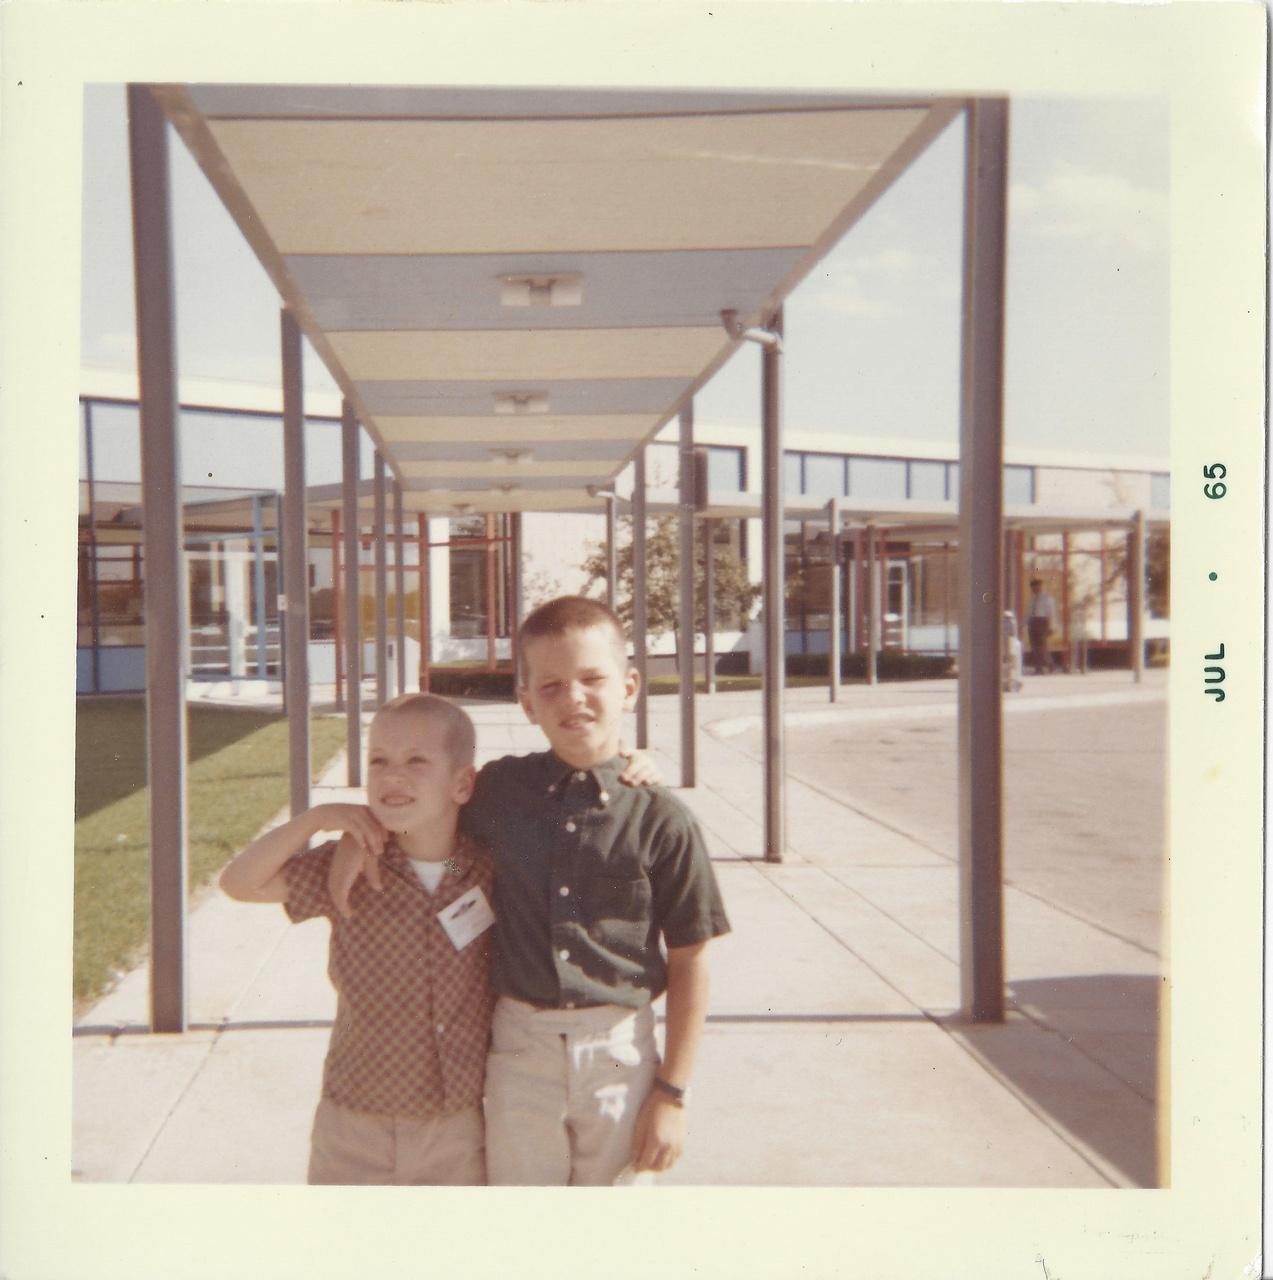 John & Jeff - July 1965